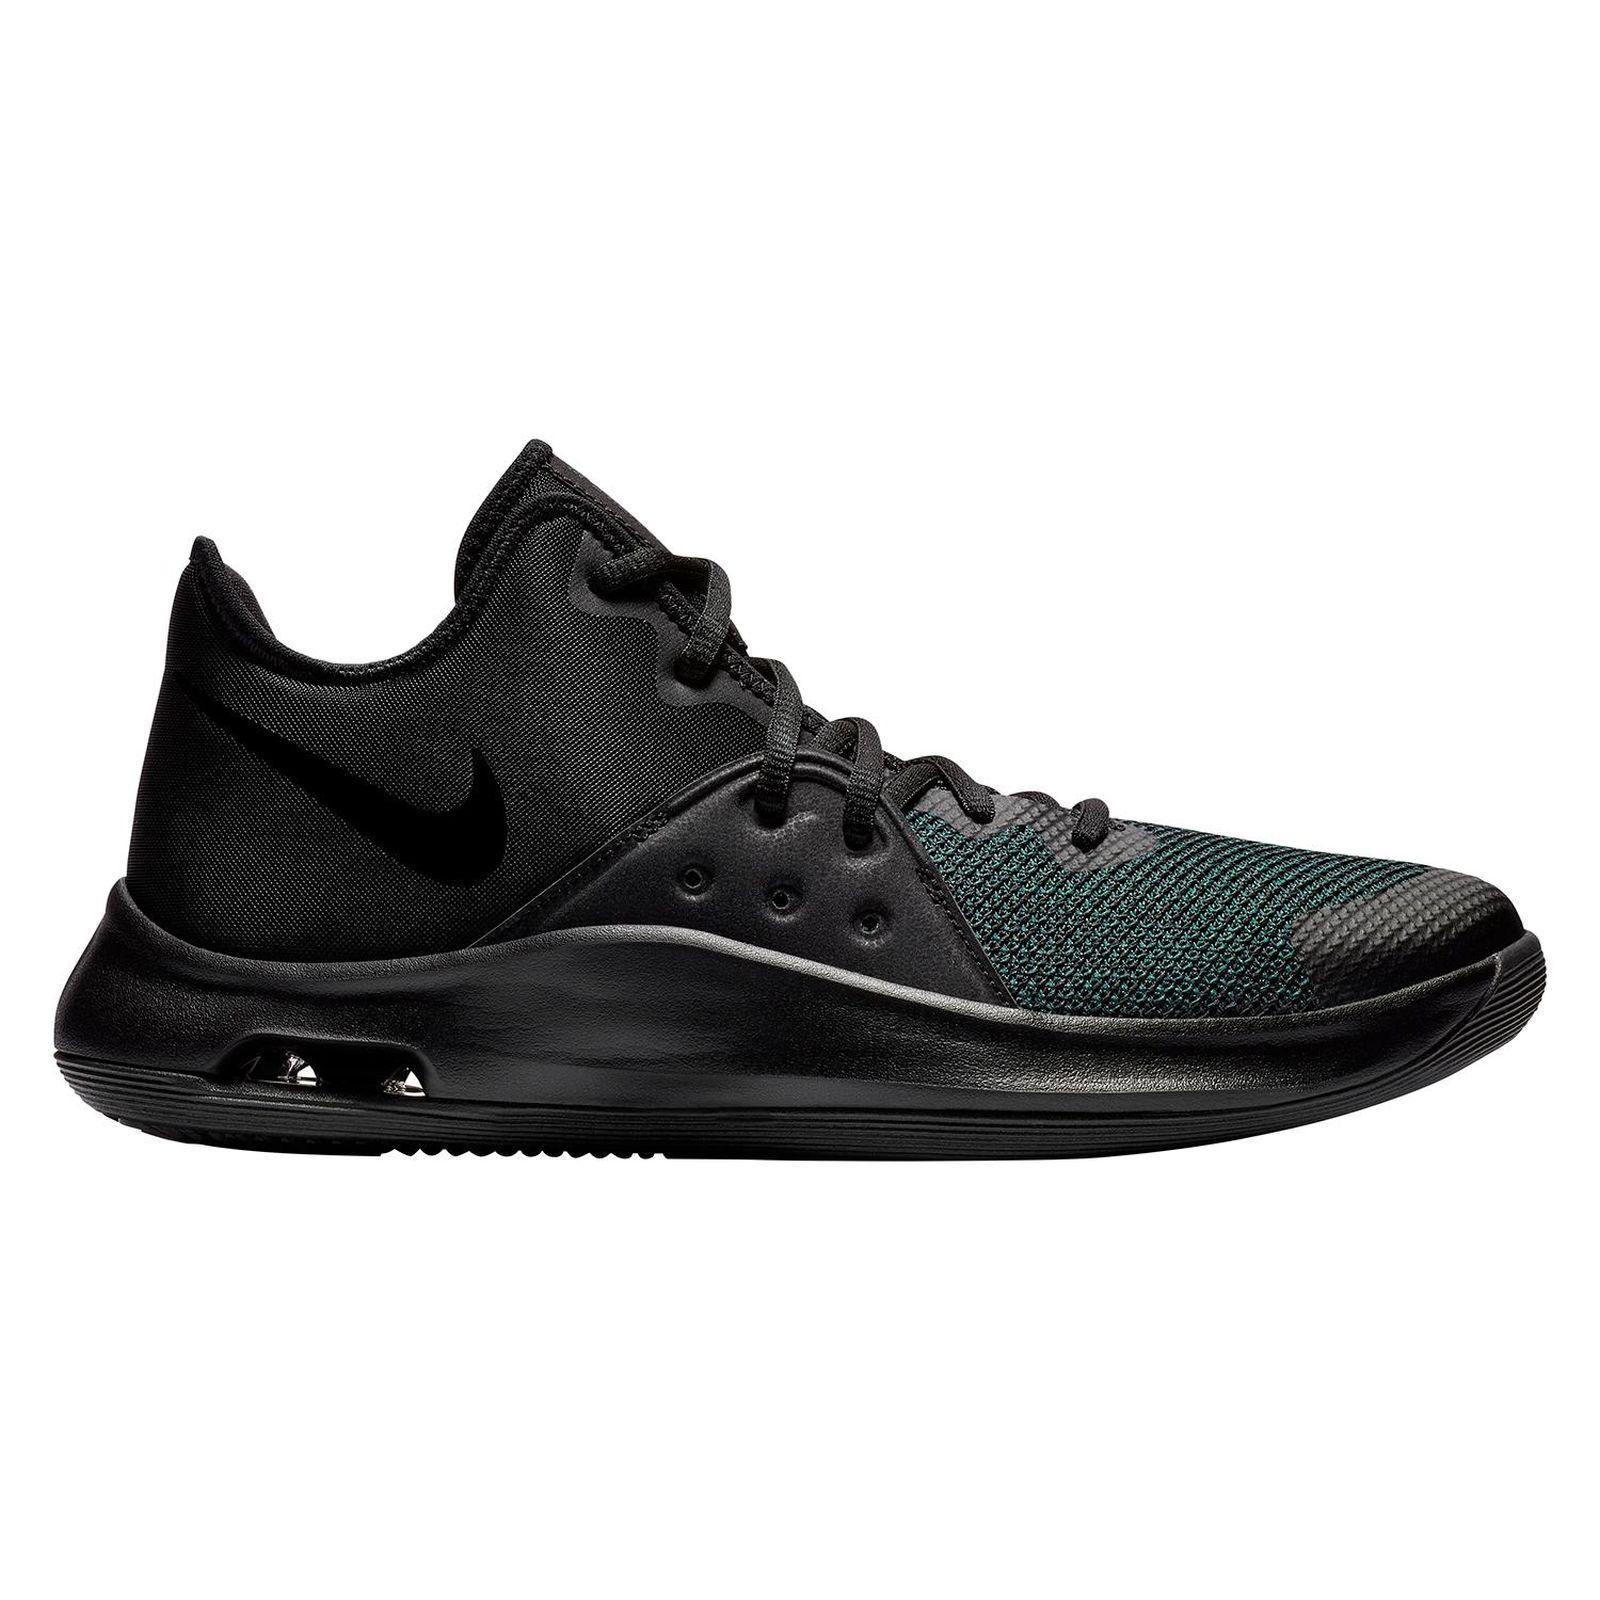 new concept d0a1e 082a2 Chaussures homme Nike basketball chaussures de sport chaussures NIKE AIR  VERSITILE III noir AO4430 002. Etat de l article  Neuf